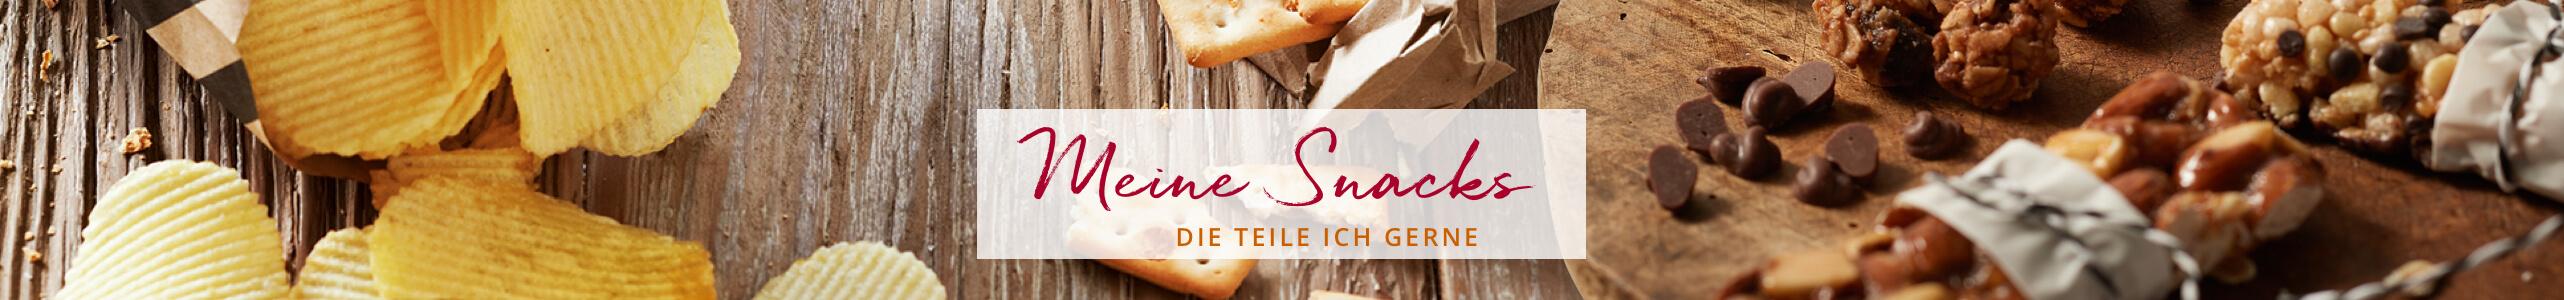 Glutenfreie, laktosefreie Knabberartikel | FoodOase.de online ...